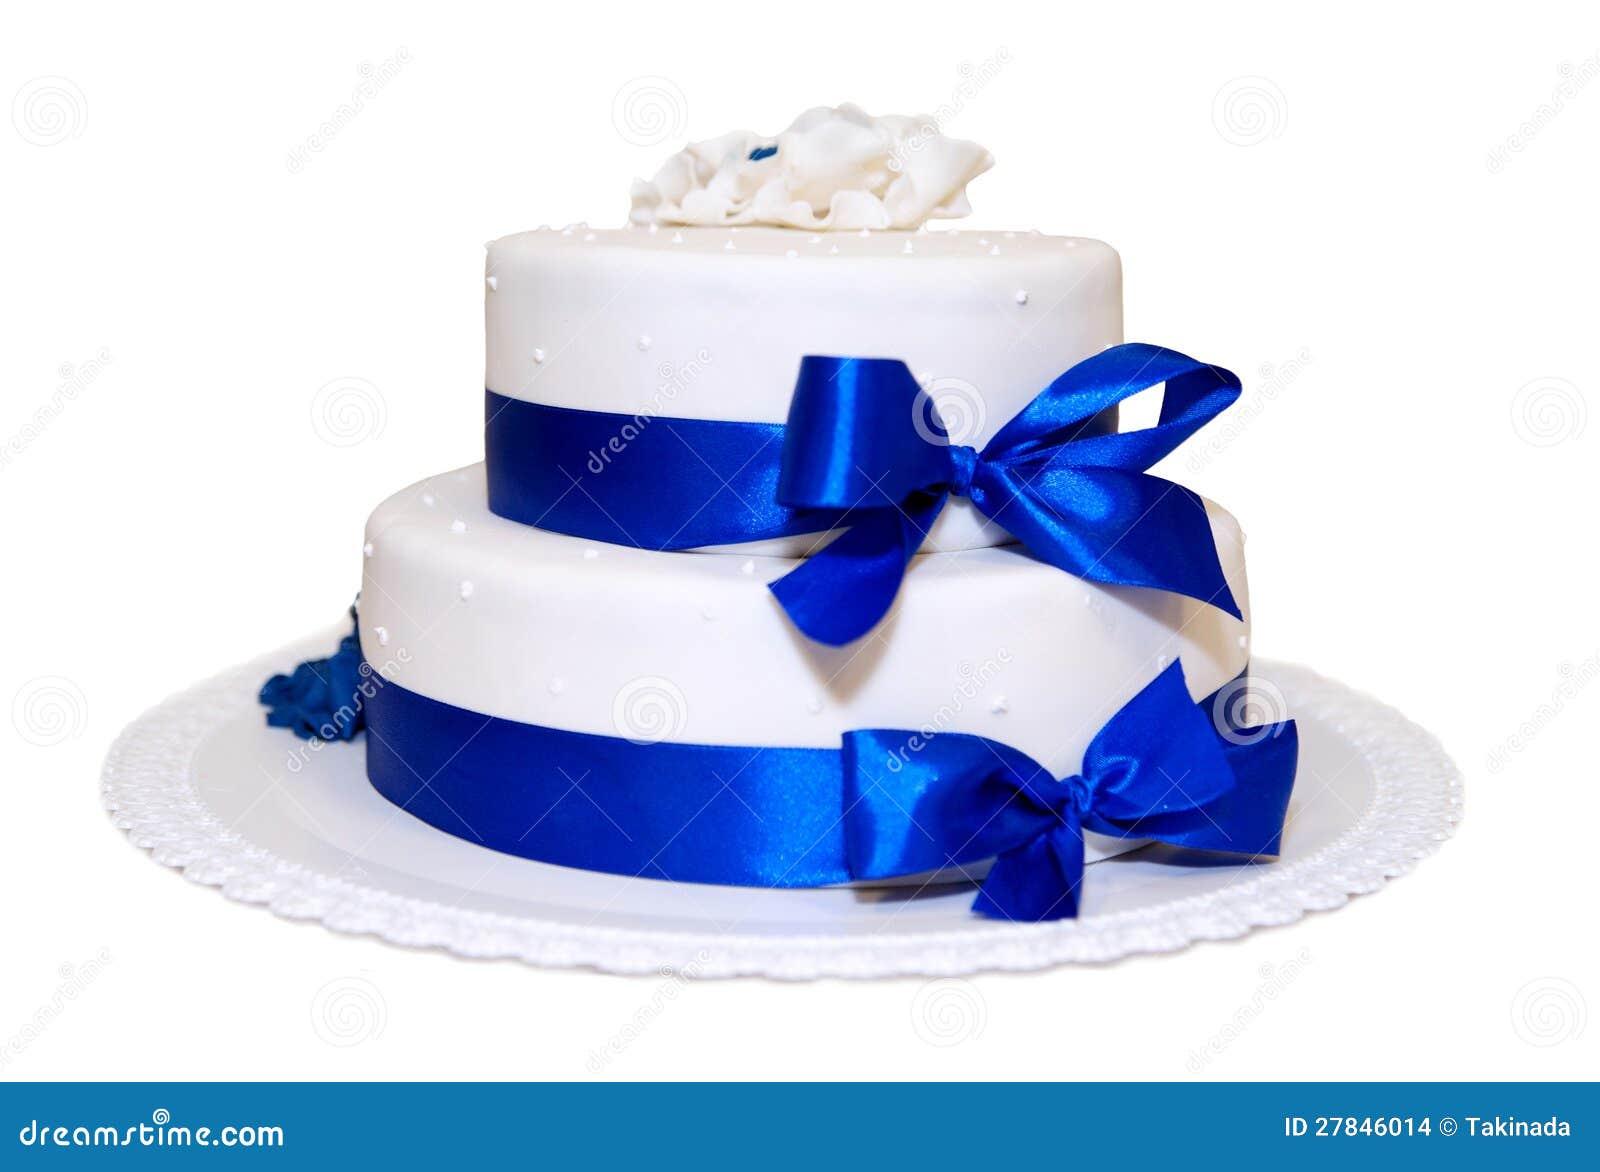 Fantastic Blue And White Wedding Cake Component - Blue Wedding Color ...